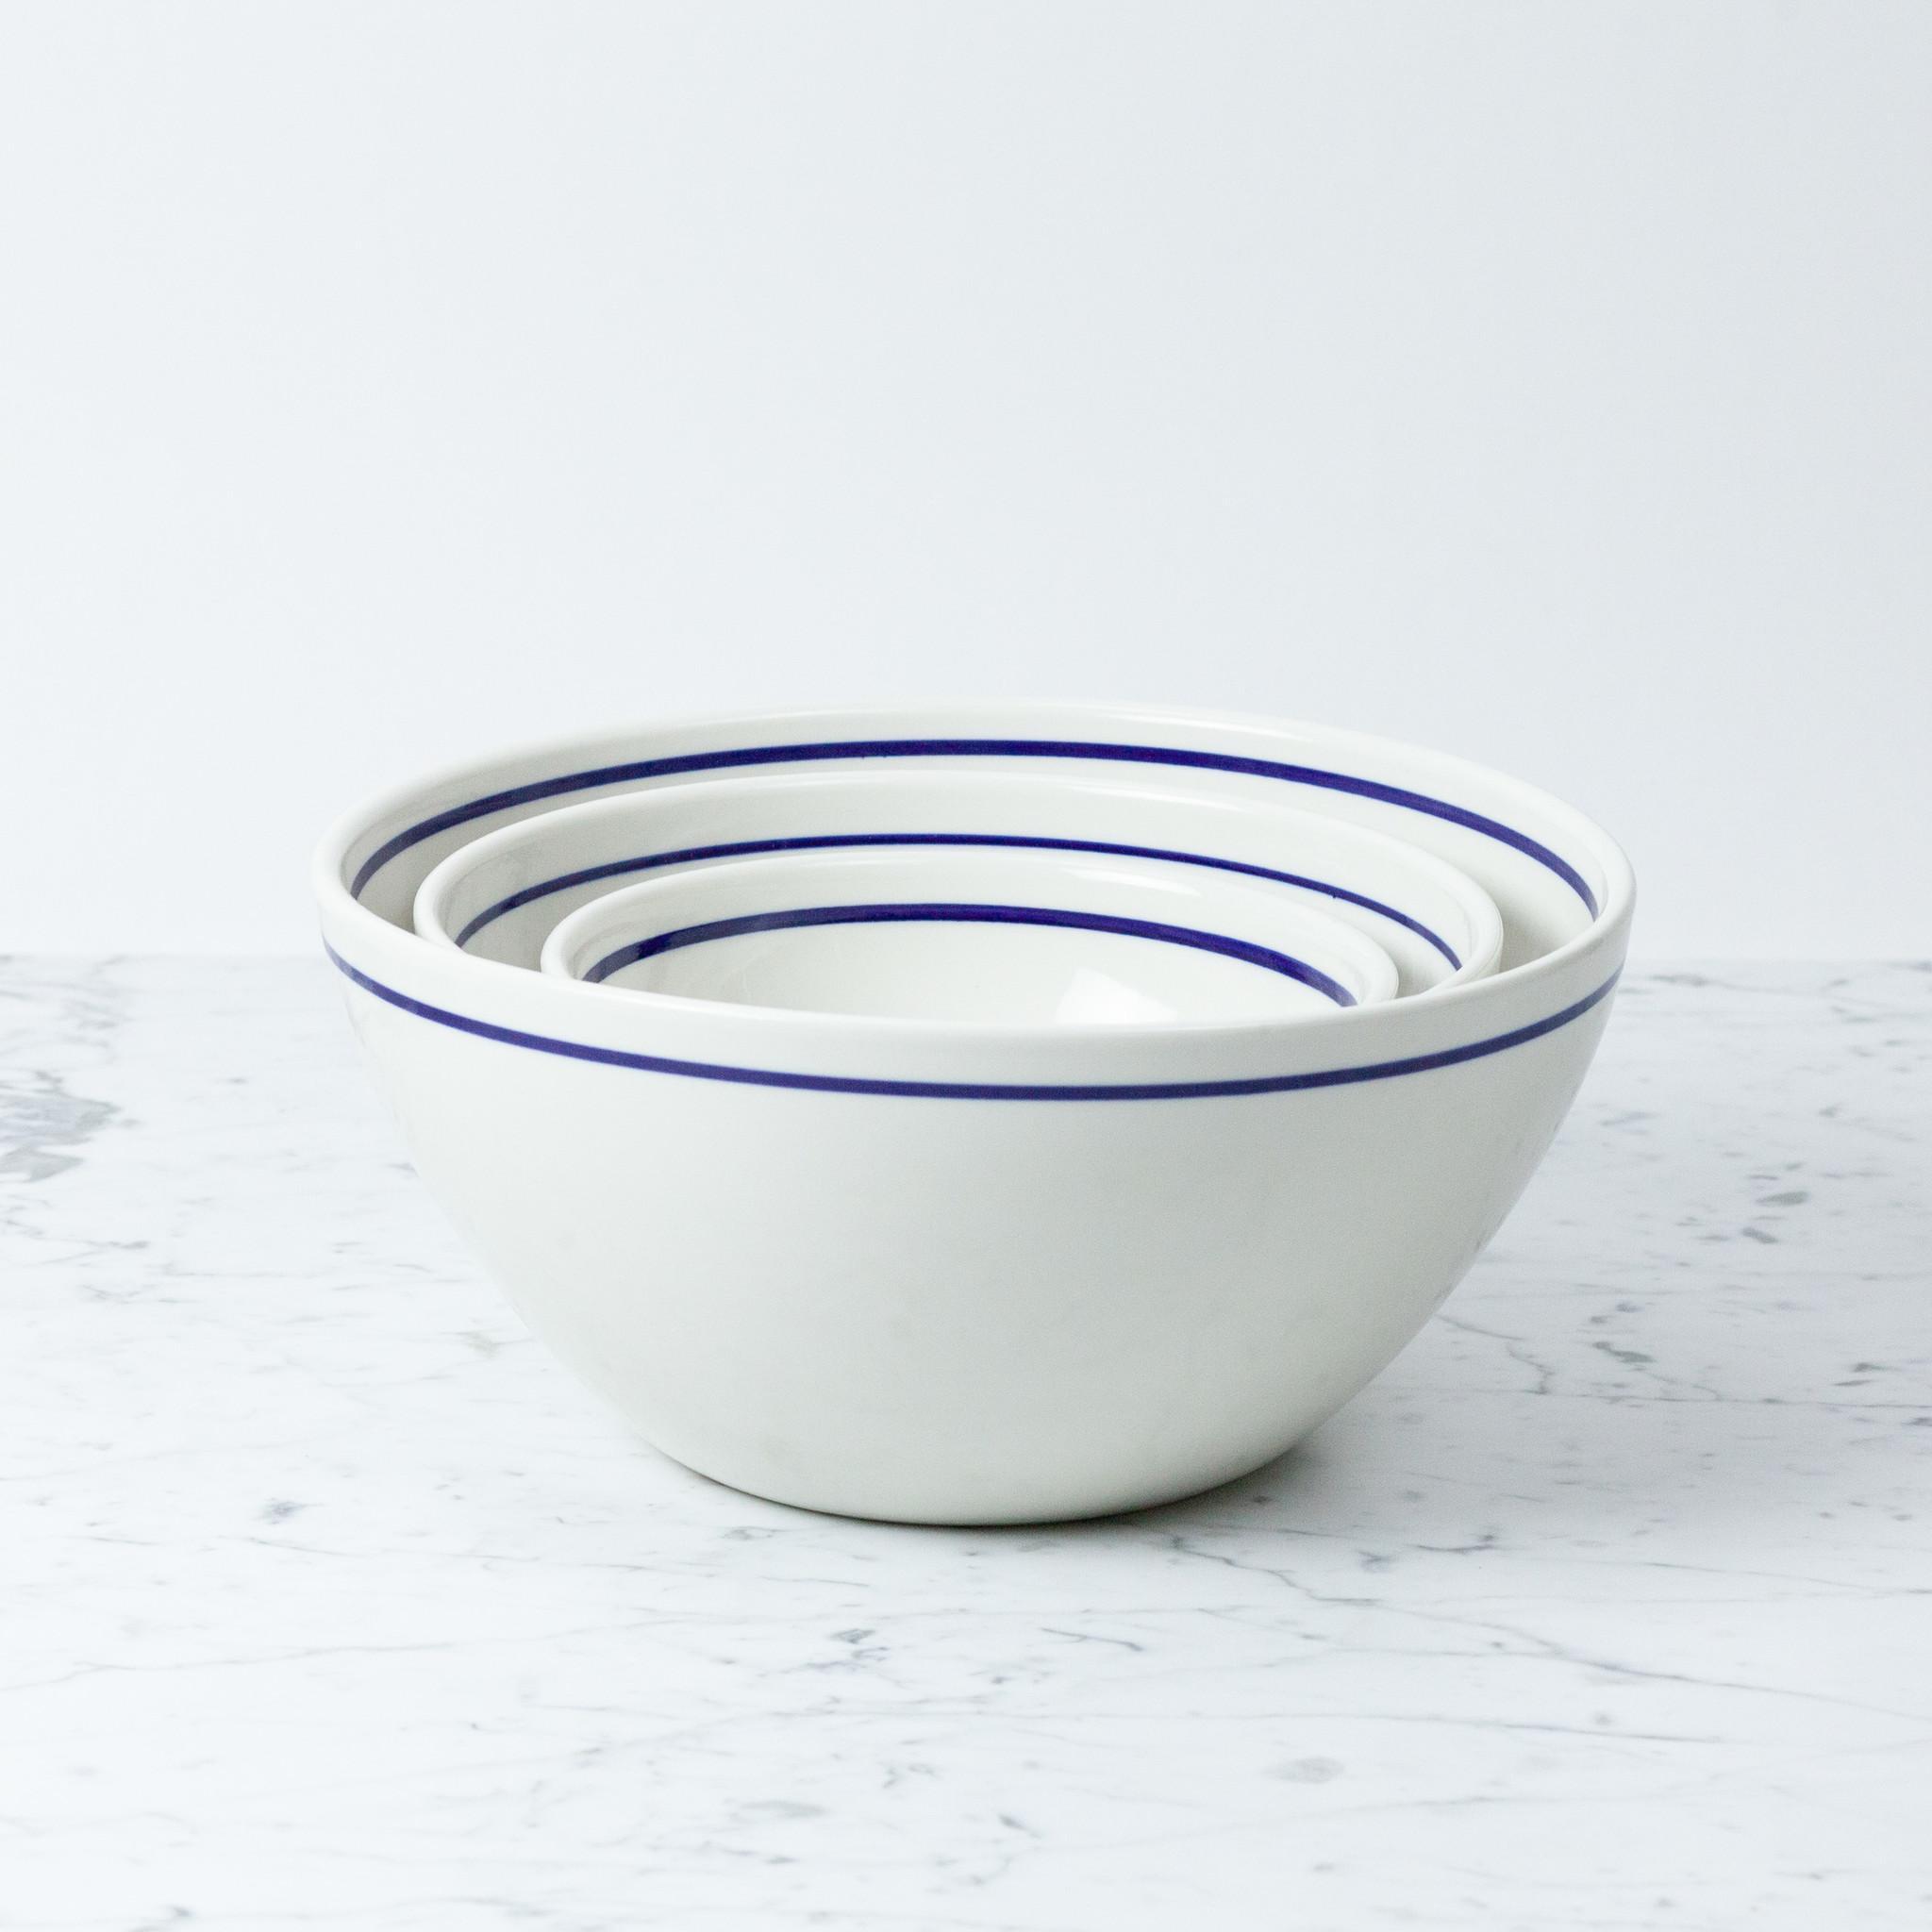 "John Julian John Julian Porcelain Serving Bowls with Blue Line - Large - 12"""